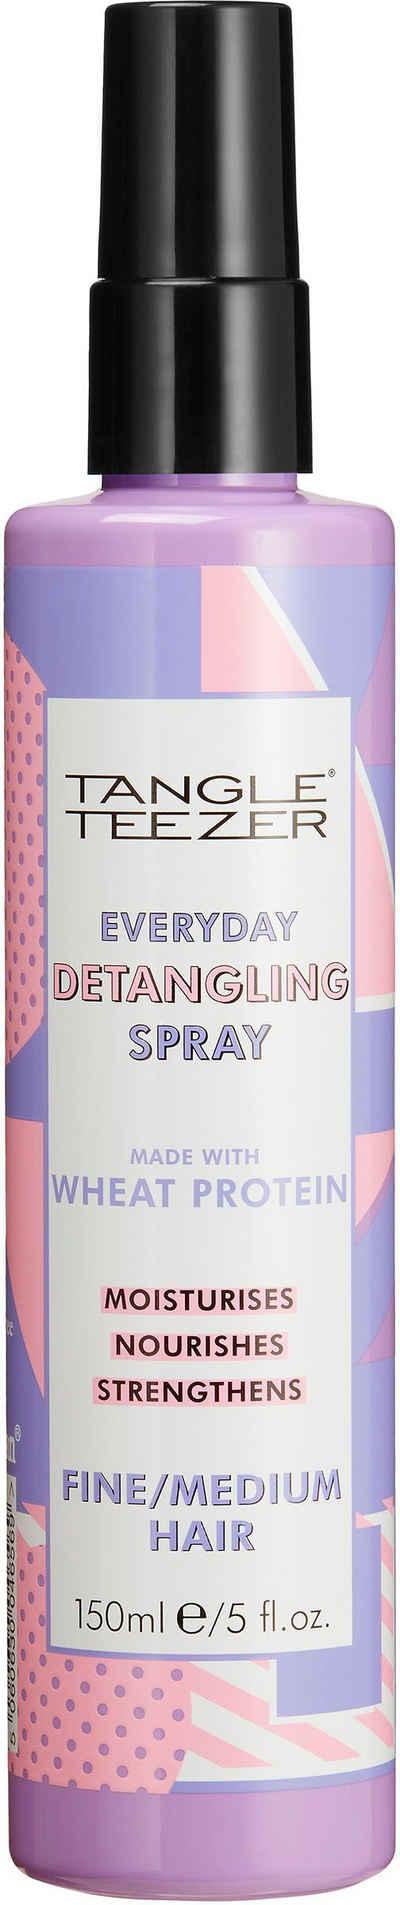 TANGLE TEEZER Haarpflege-Spray »Everyday Detangling Spray Fine/Medium Hair«